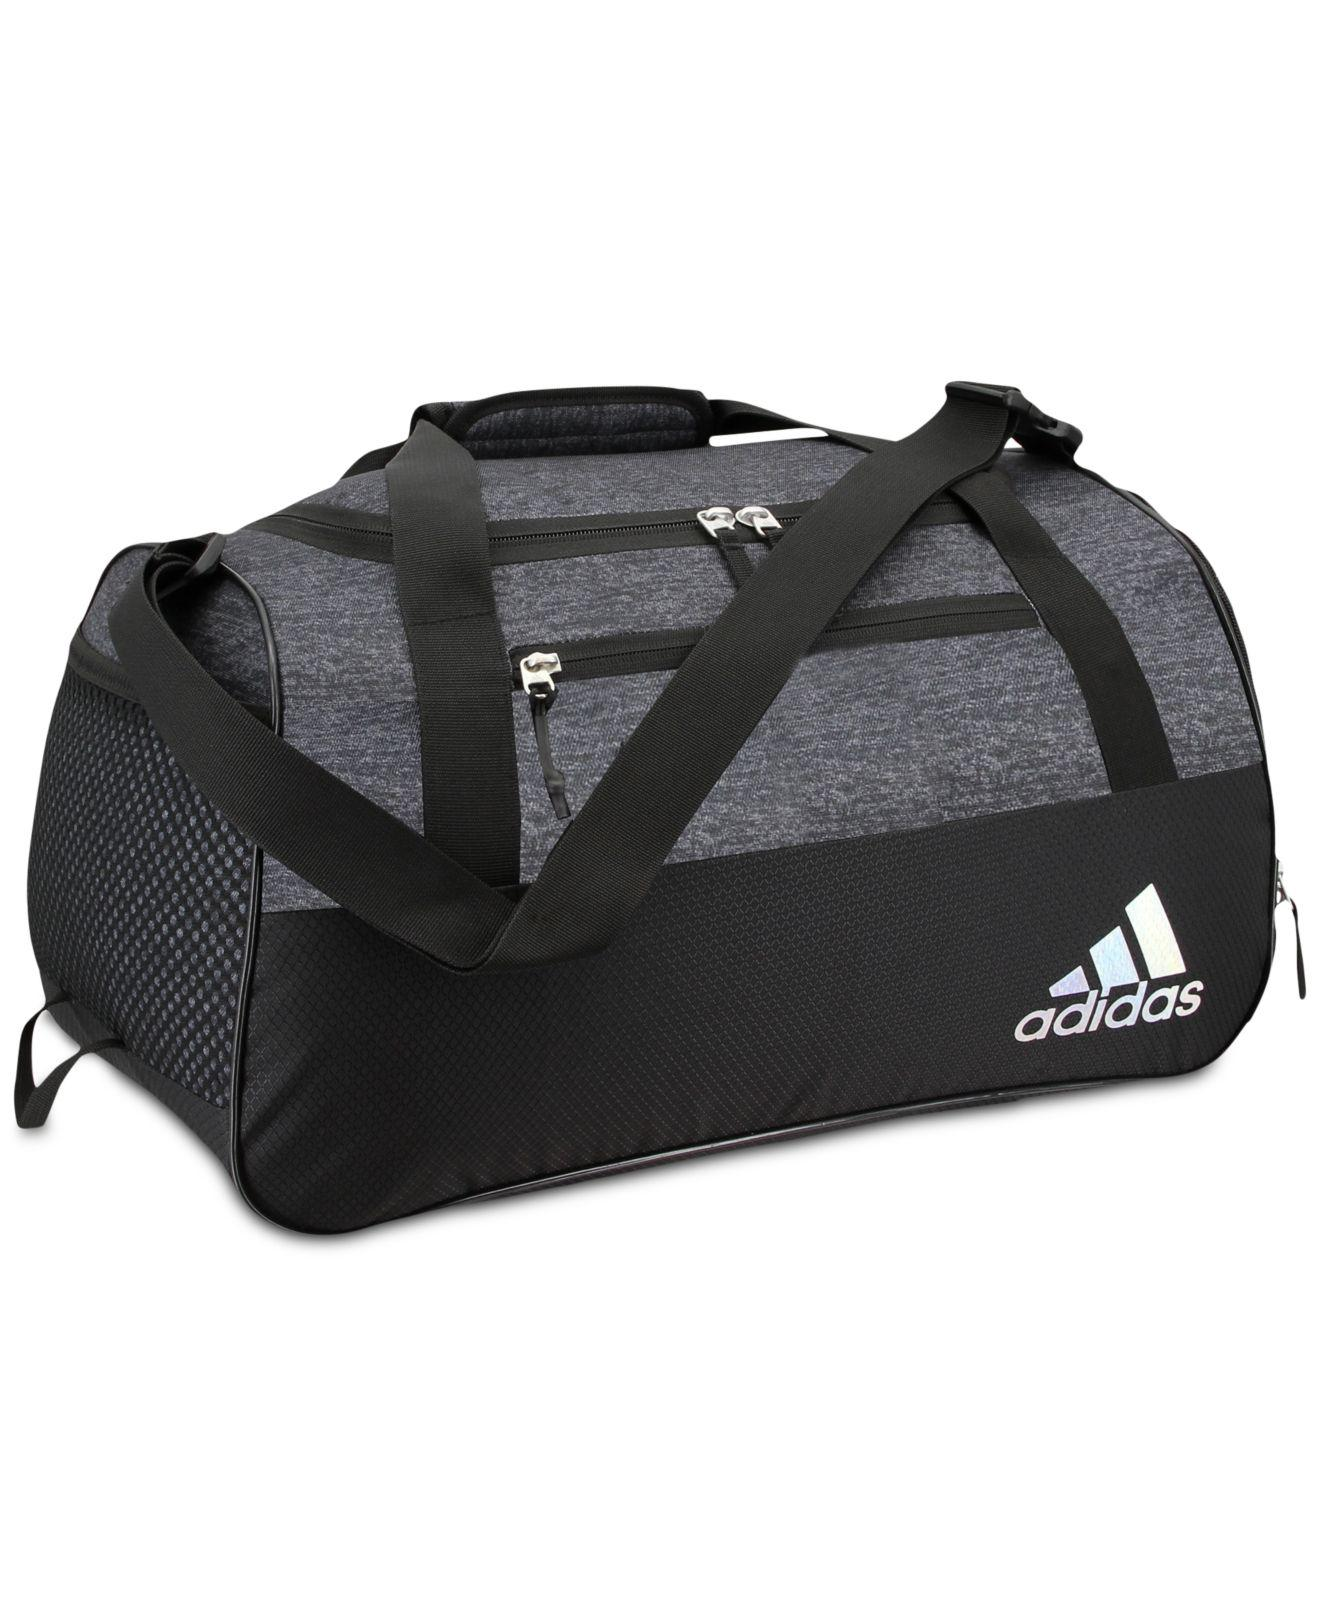 f130e1202eb9 Adidas Duffle Bags Australia - Dream Shuttles